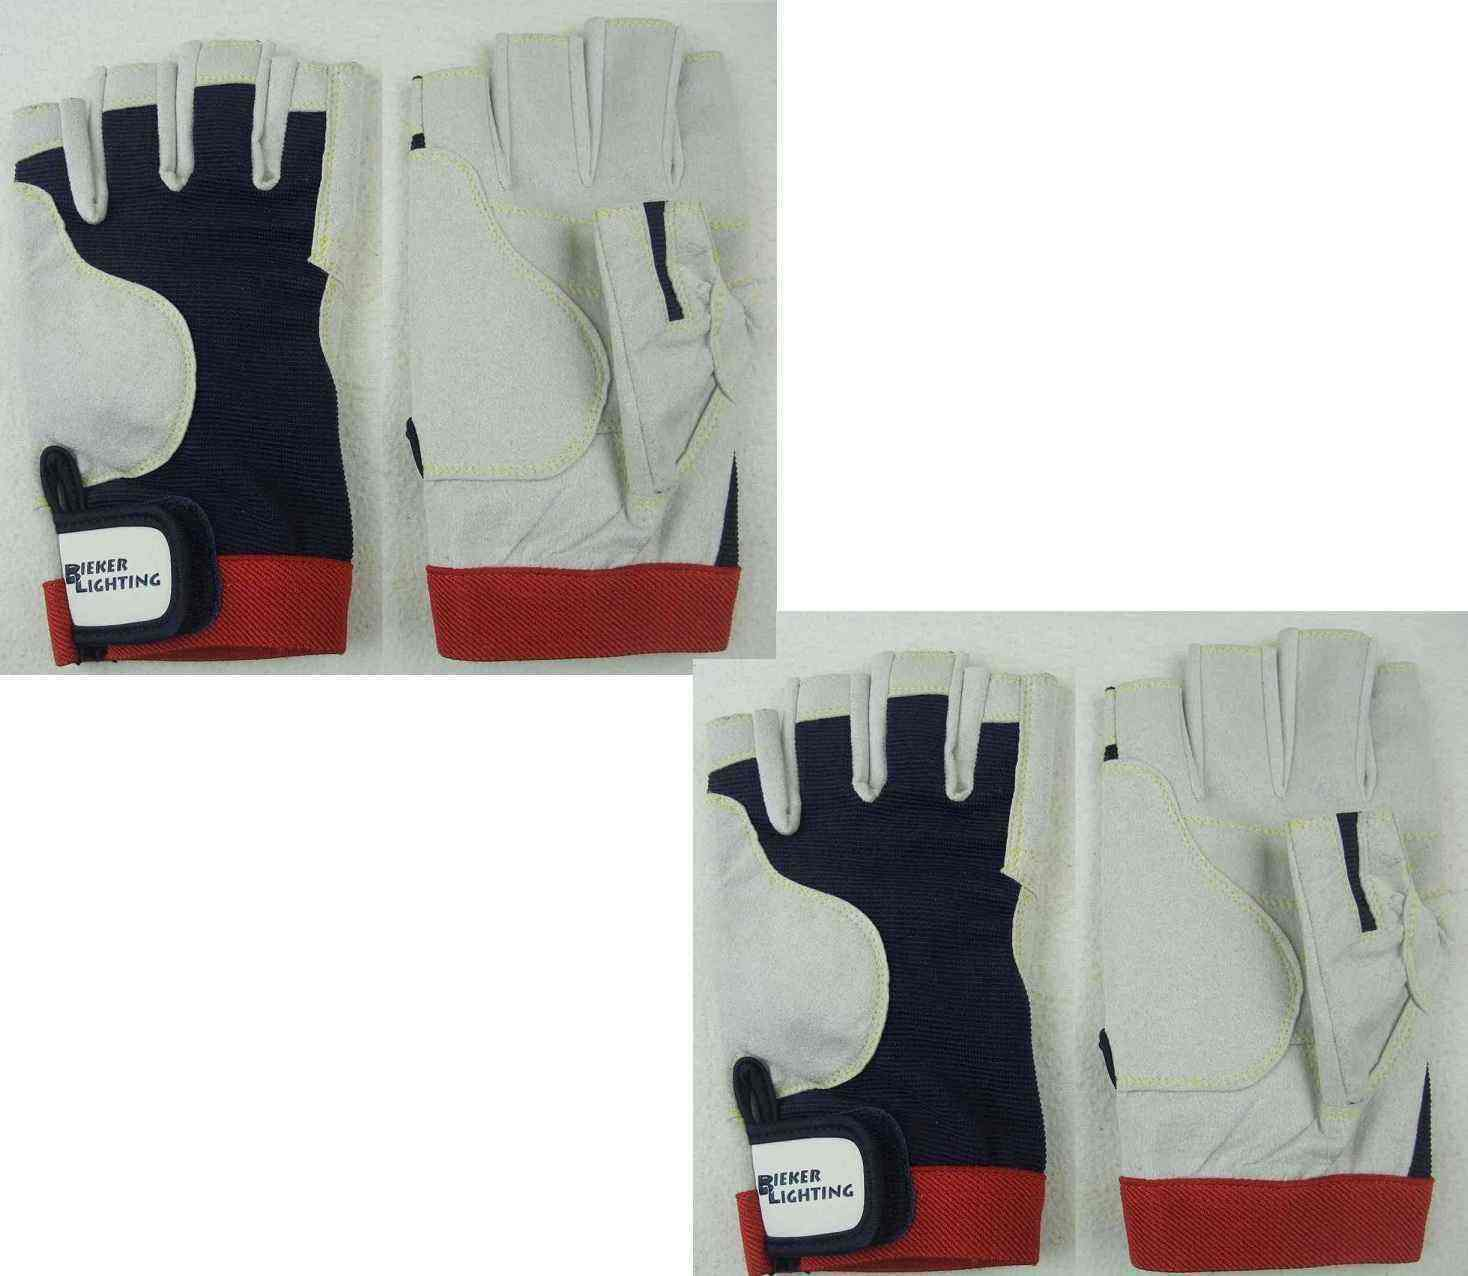 2 Paar AMARA Fahrradhandschuhe XL (10) Rigging Handschuhe Rigger Radhandschuhe